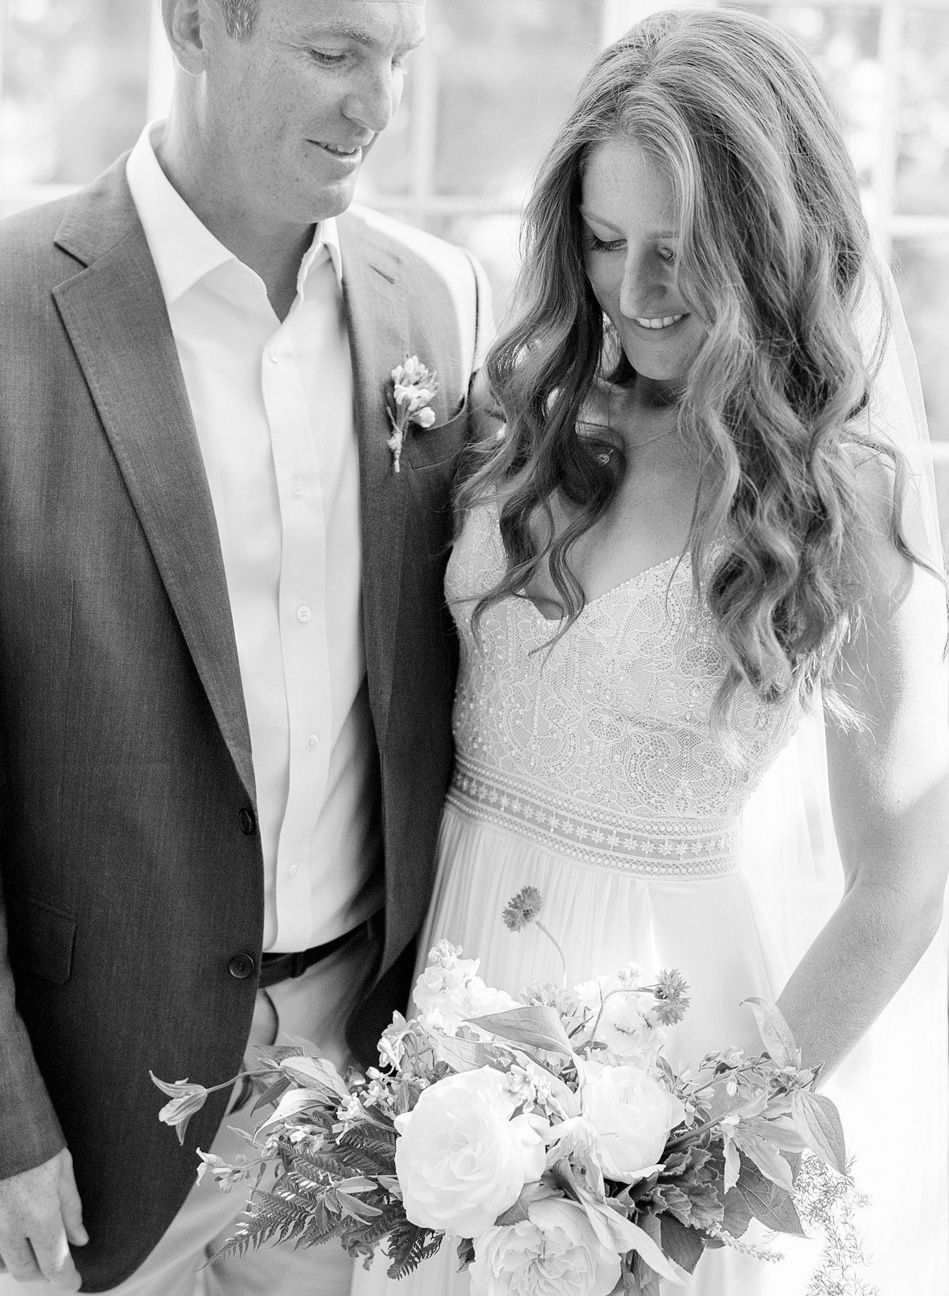 KarenHillPhotography-Padden-Wedding-0208.jpg